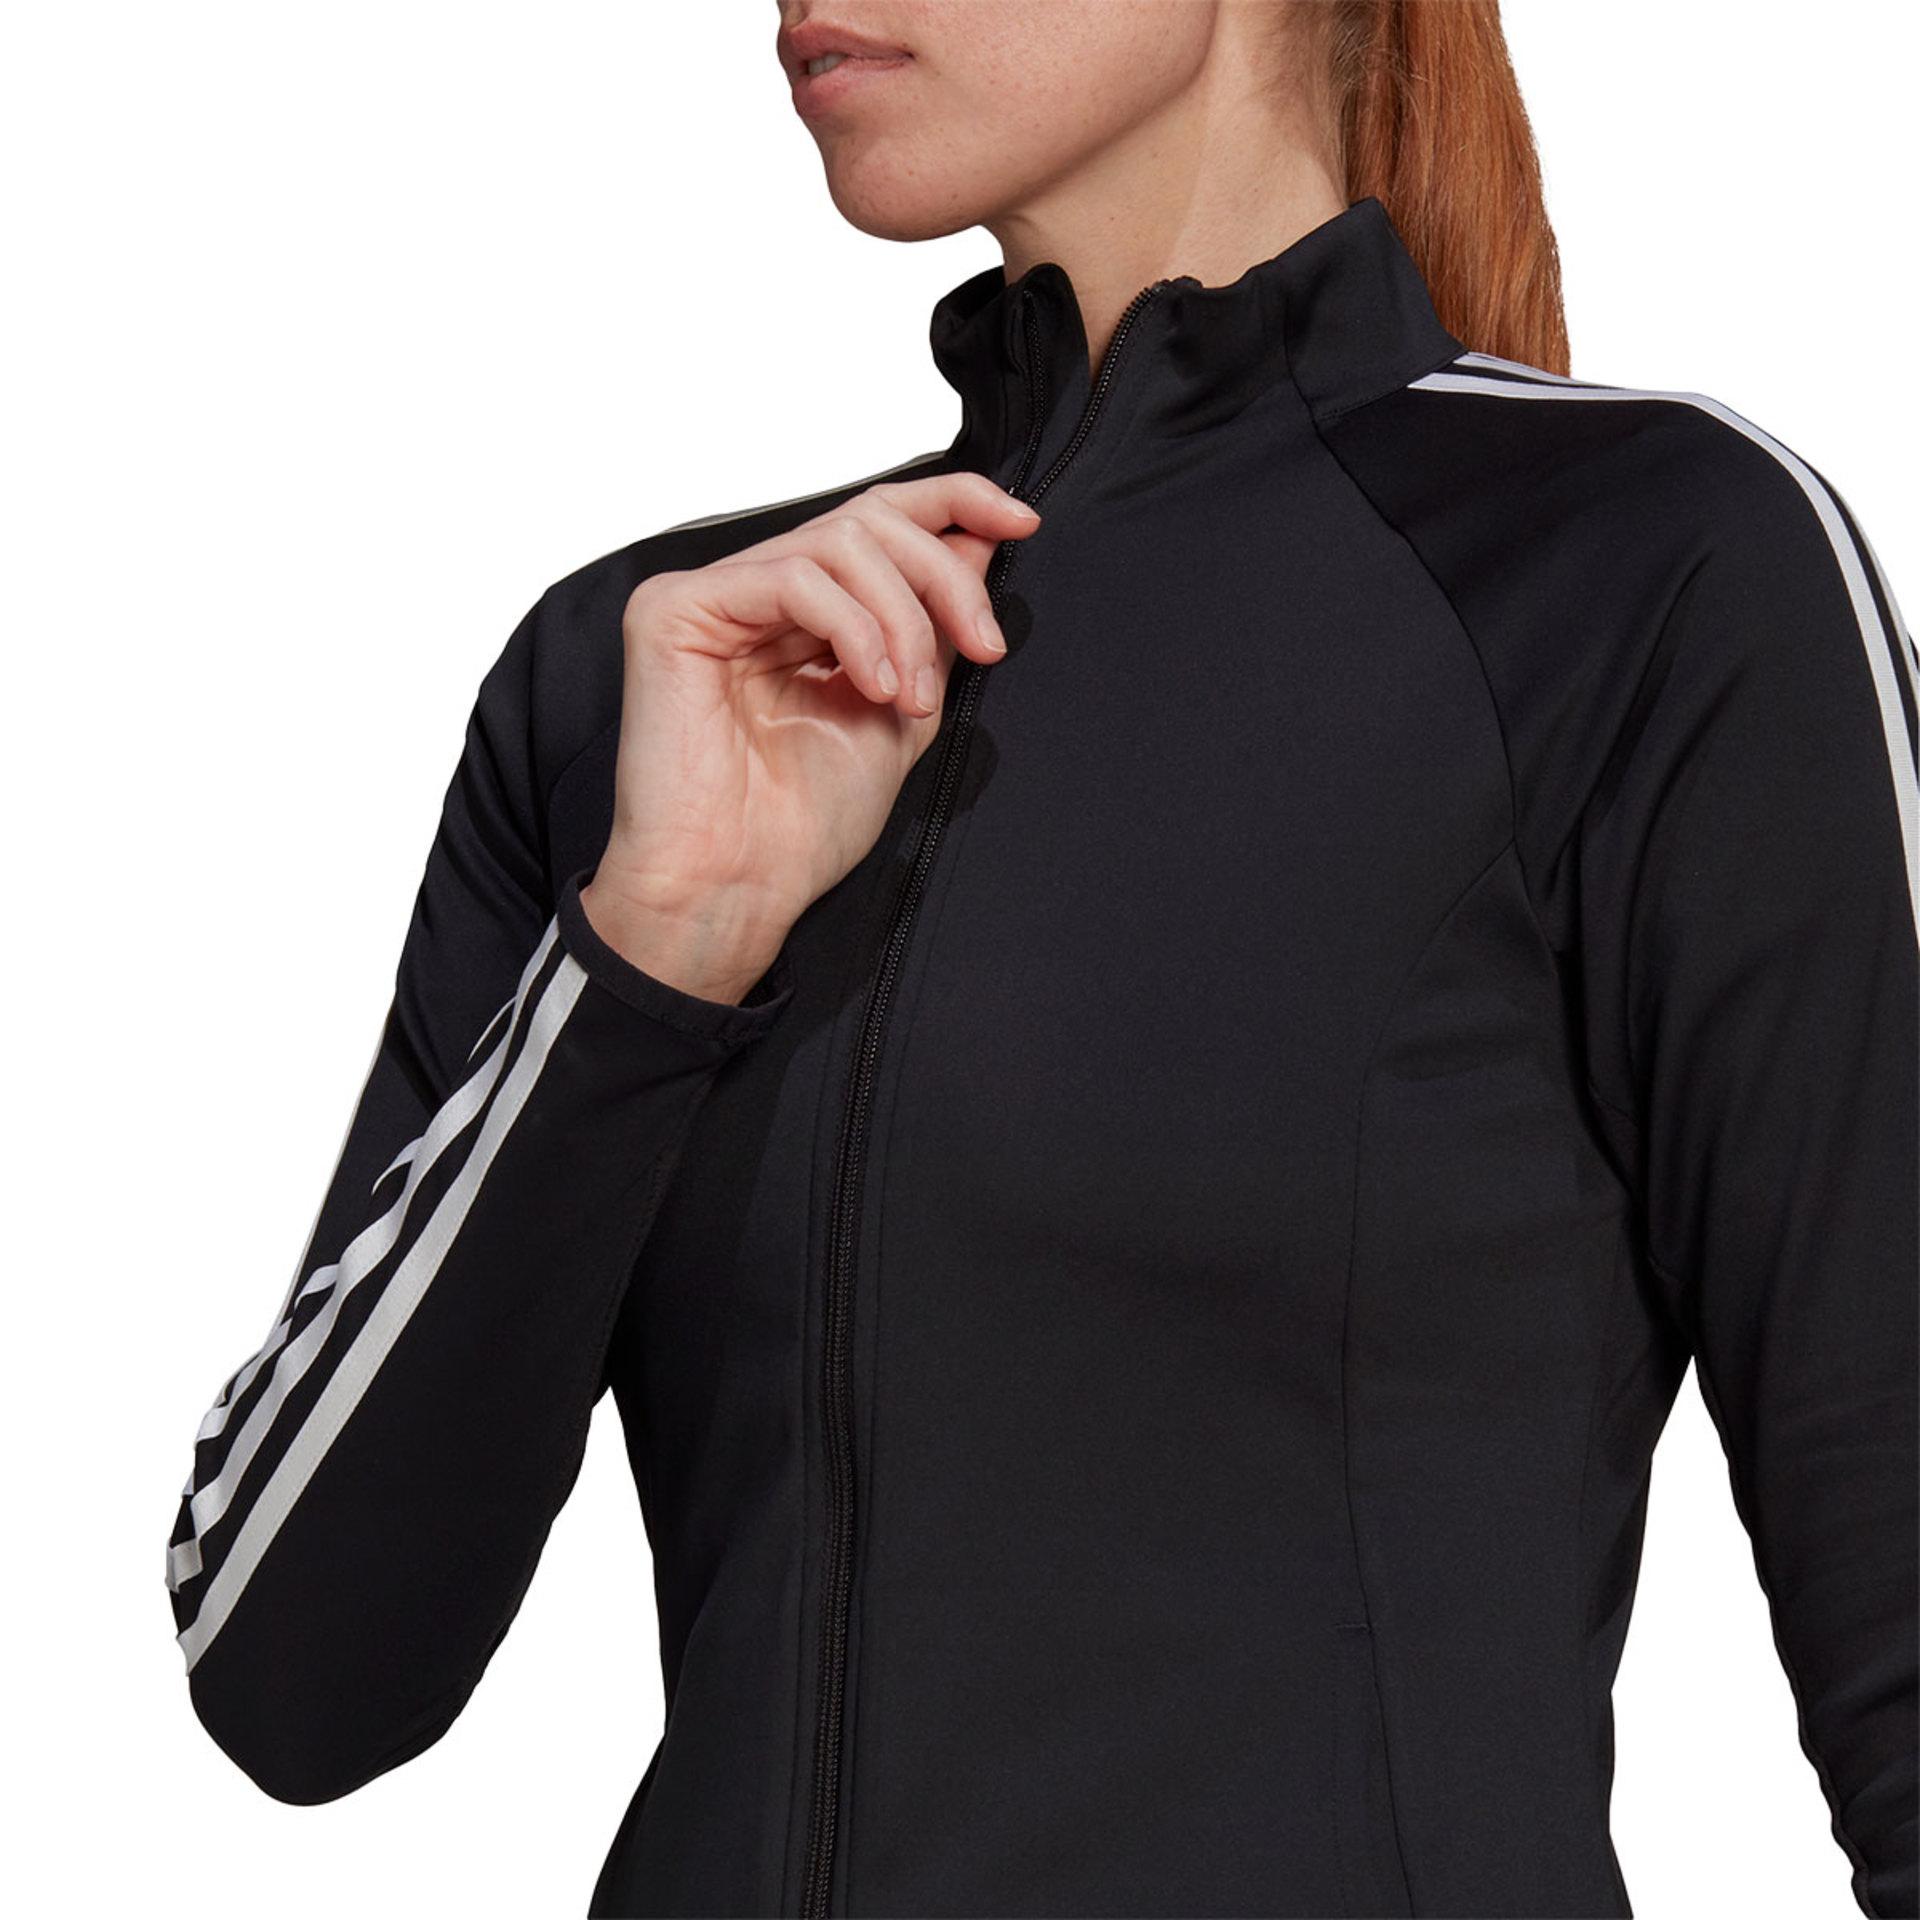 adidas 3 Stripes Hardloopjack Zwart Dames